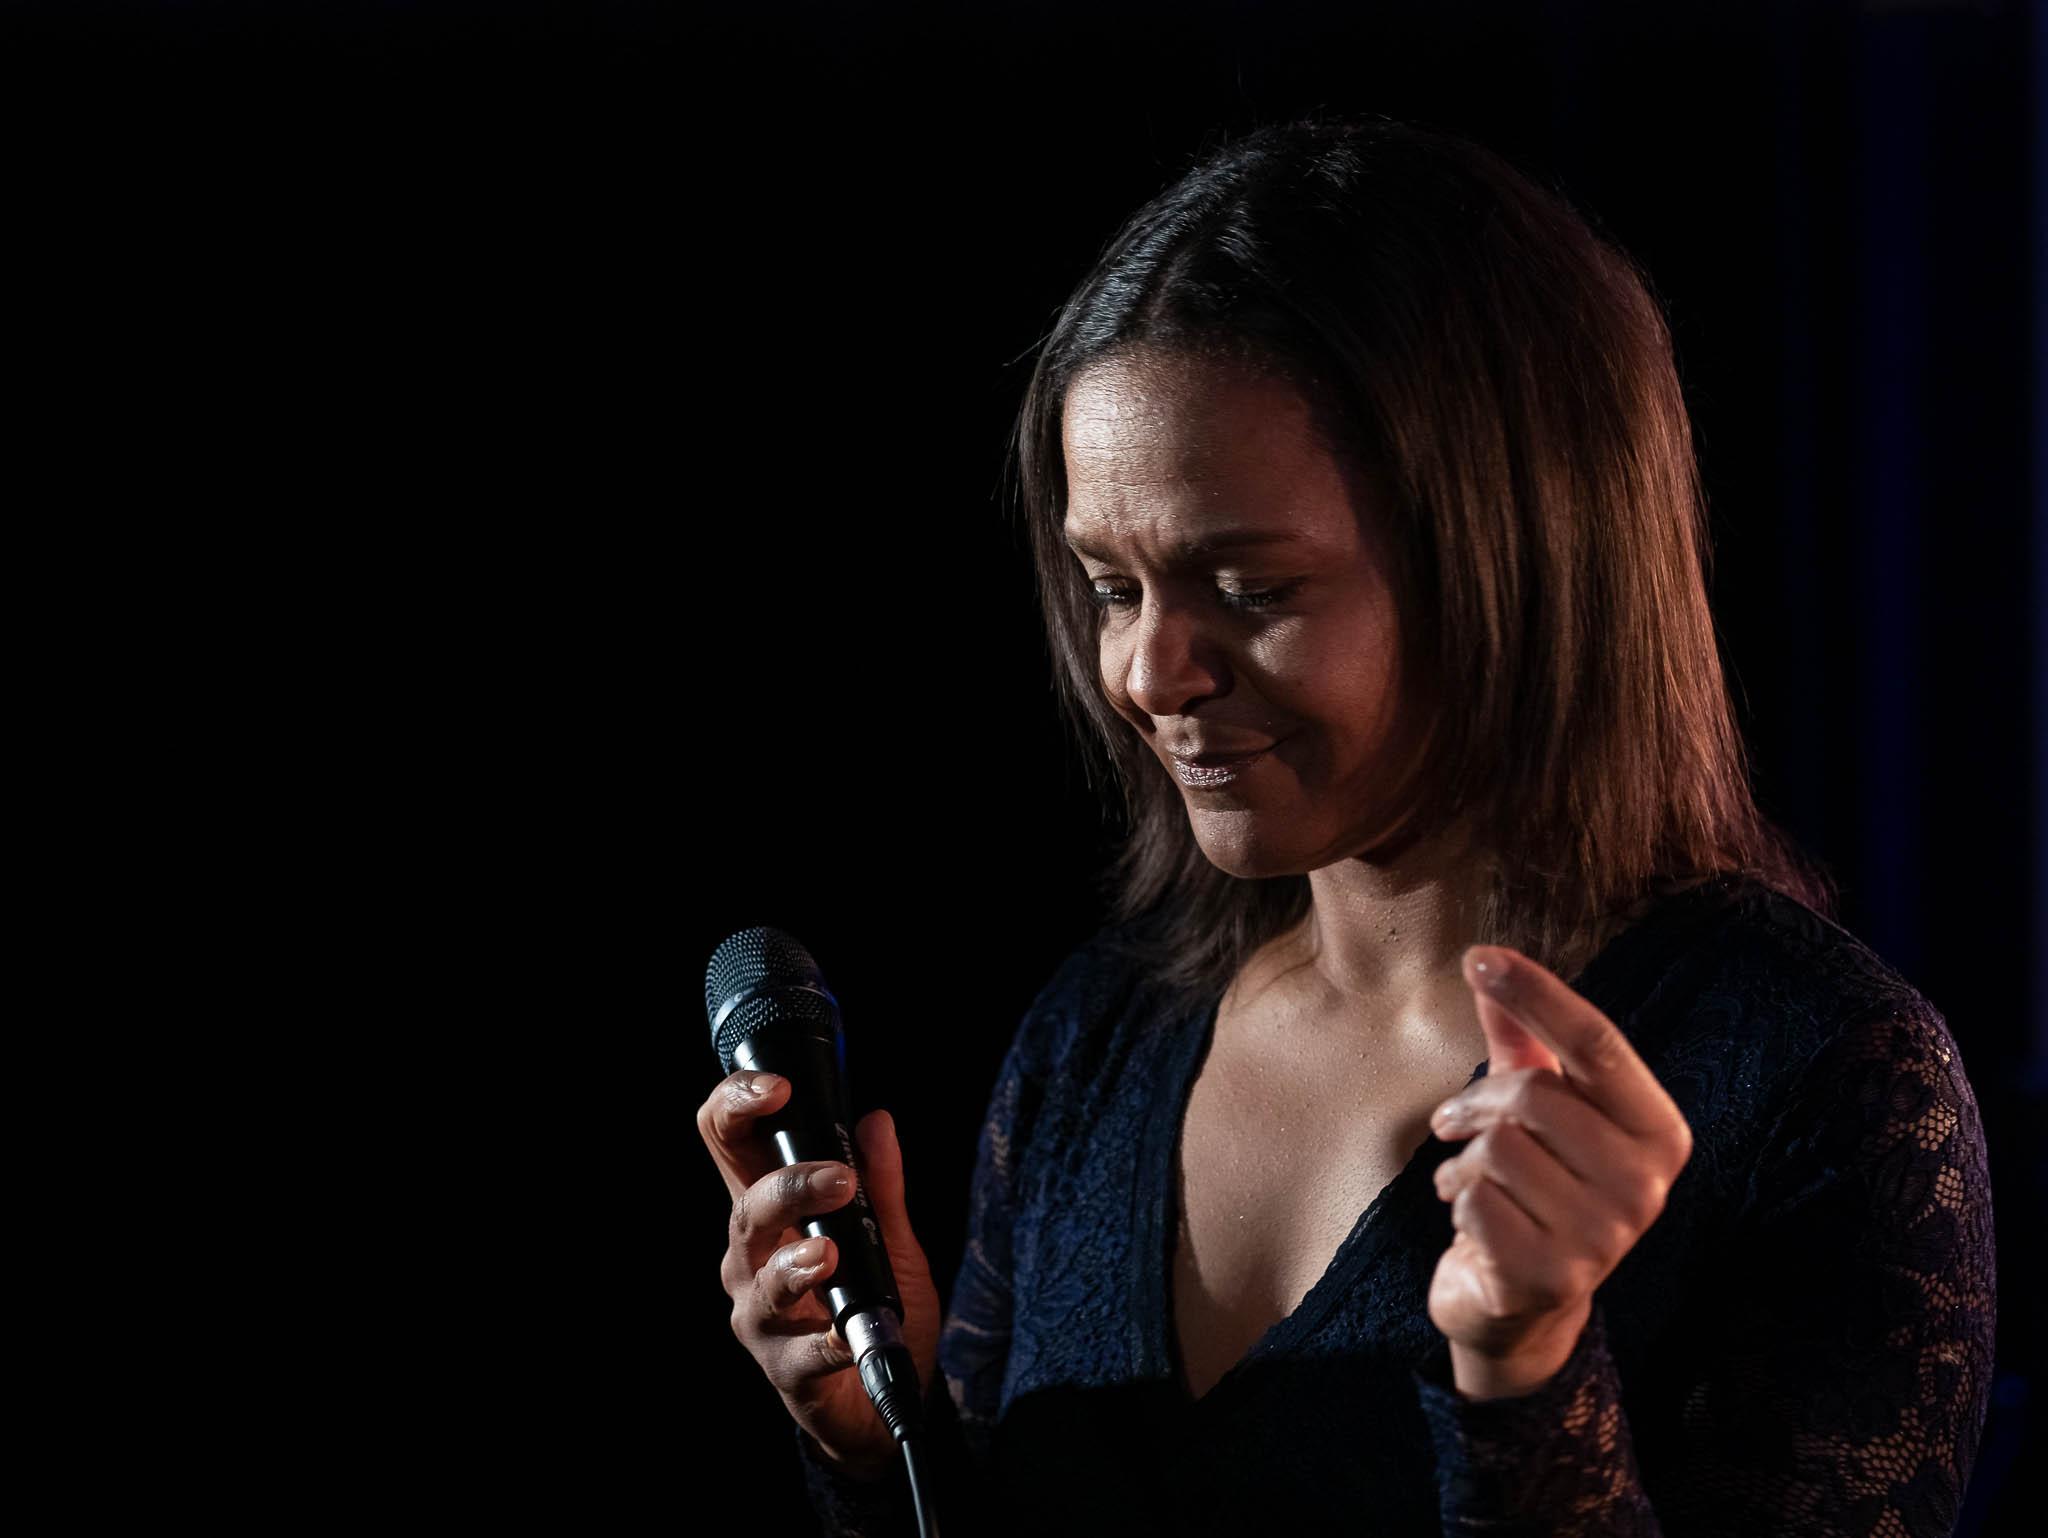 Jazzsängerin Felicia Touré